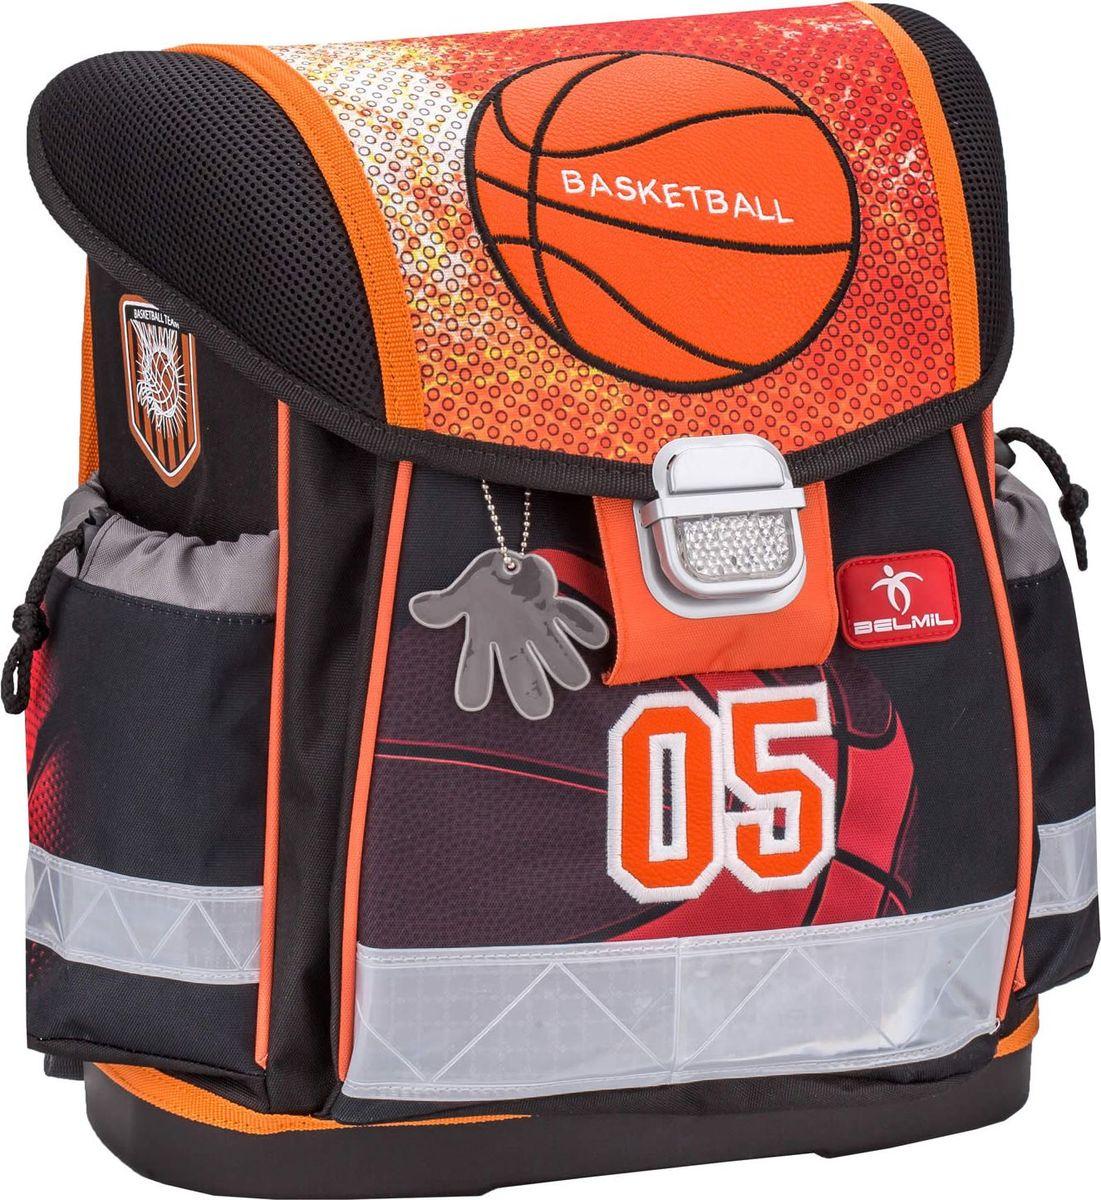 Belmil Ранец школьный Classy Basketball403-13/532